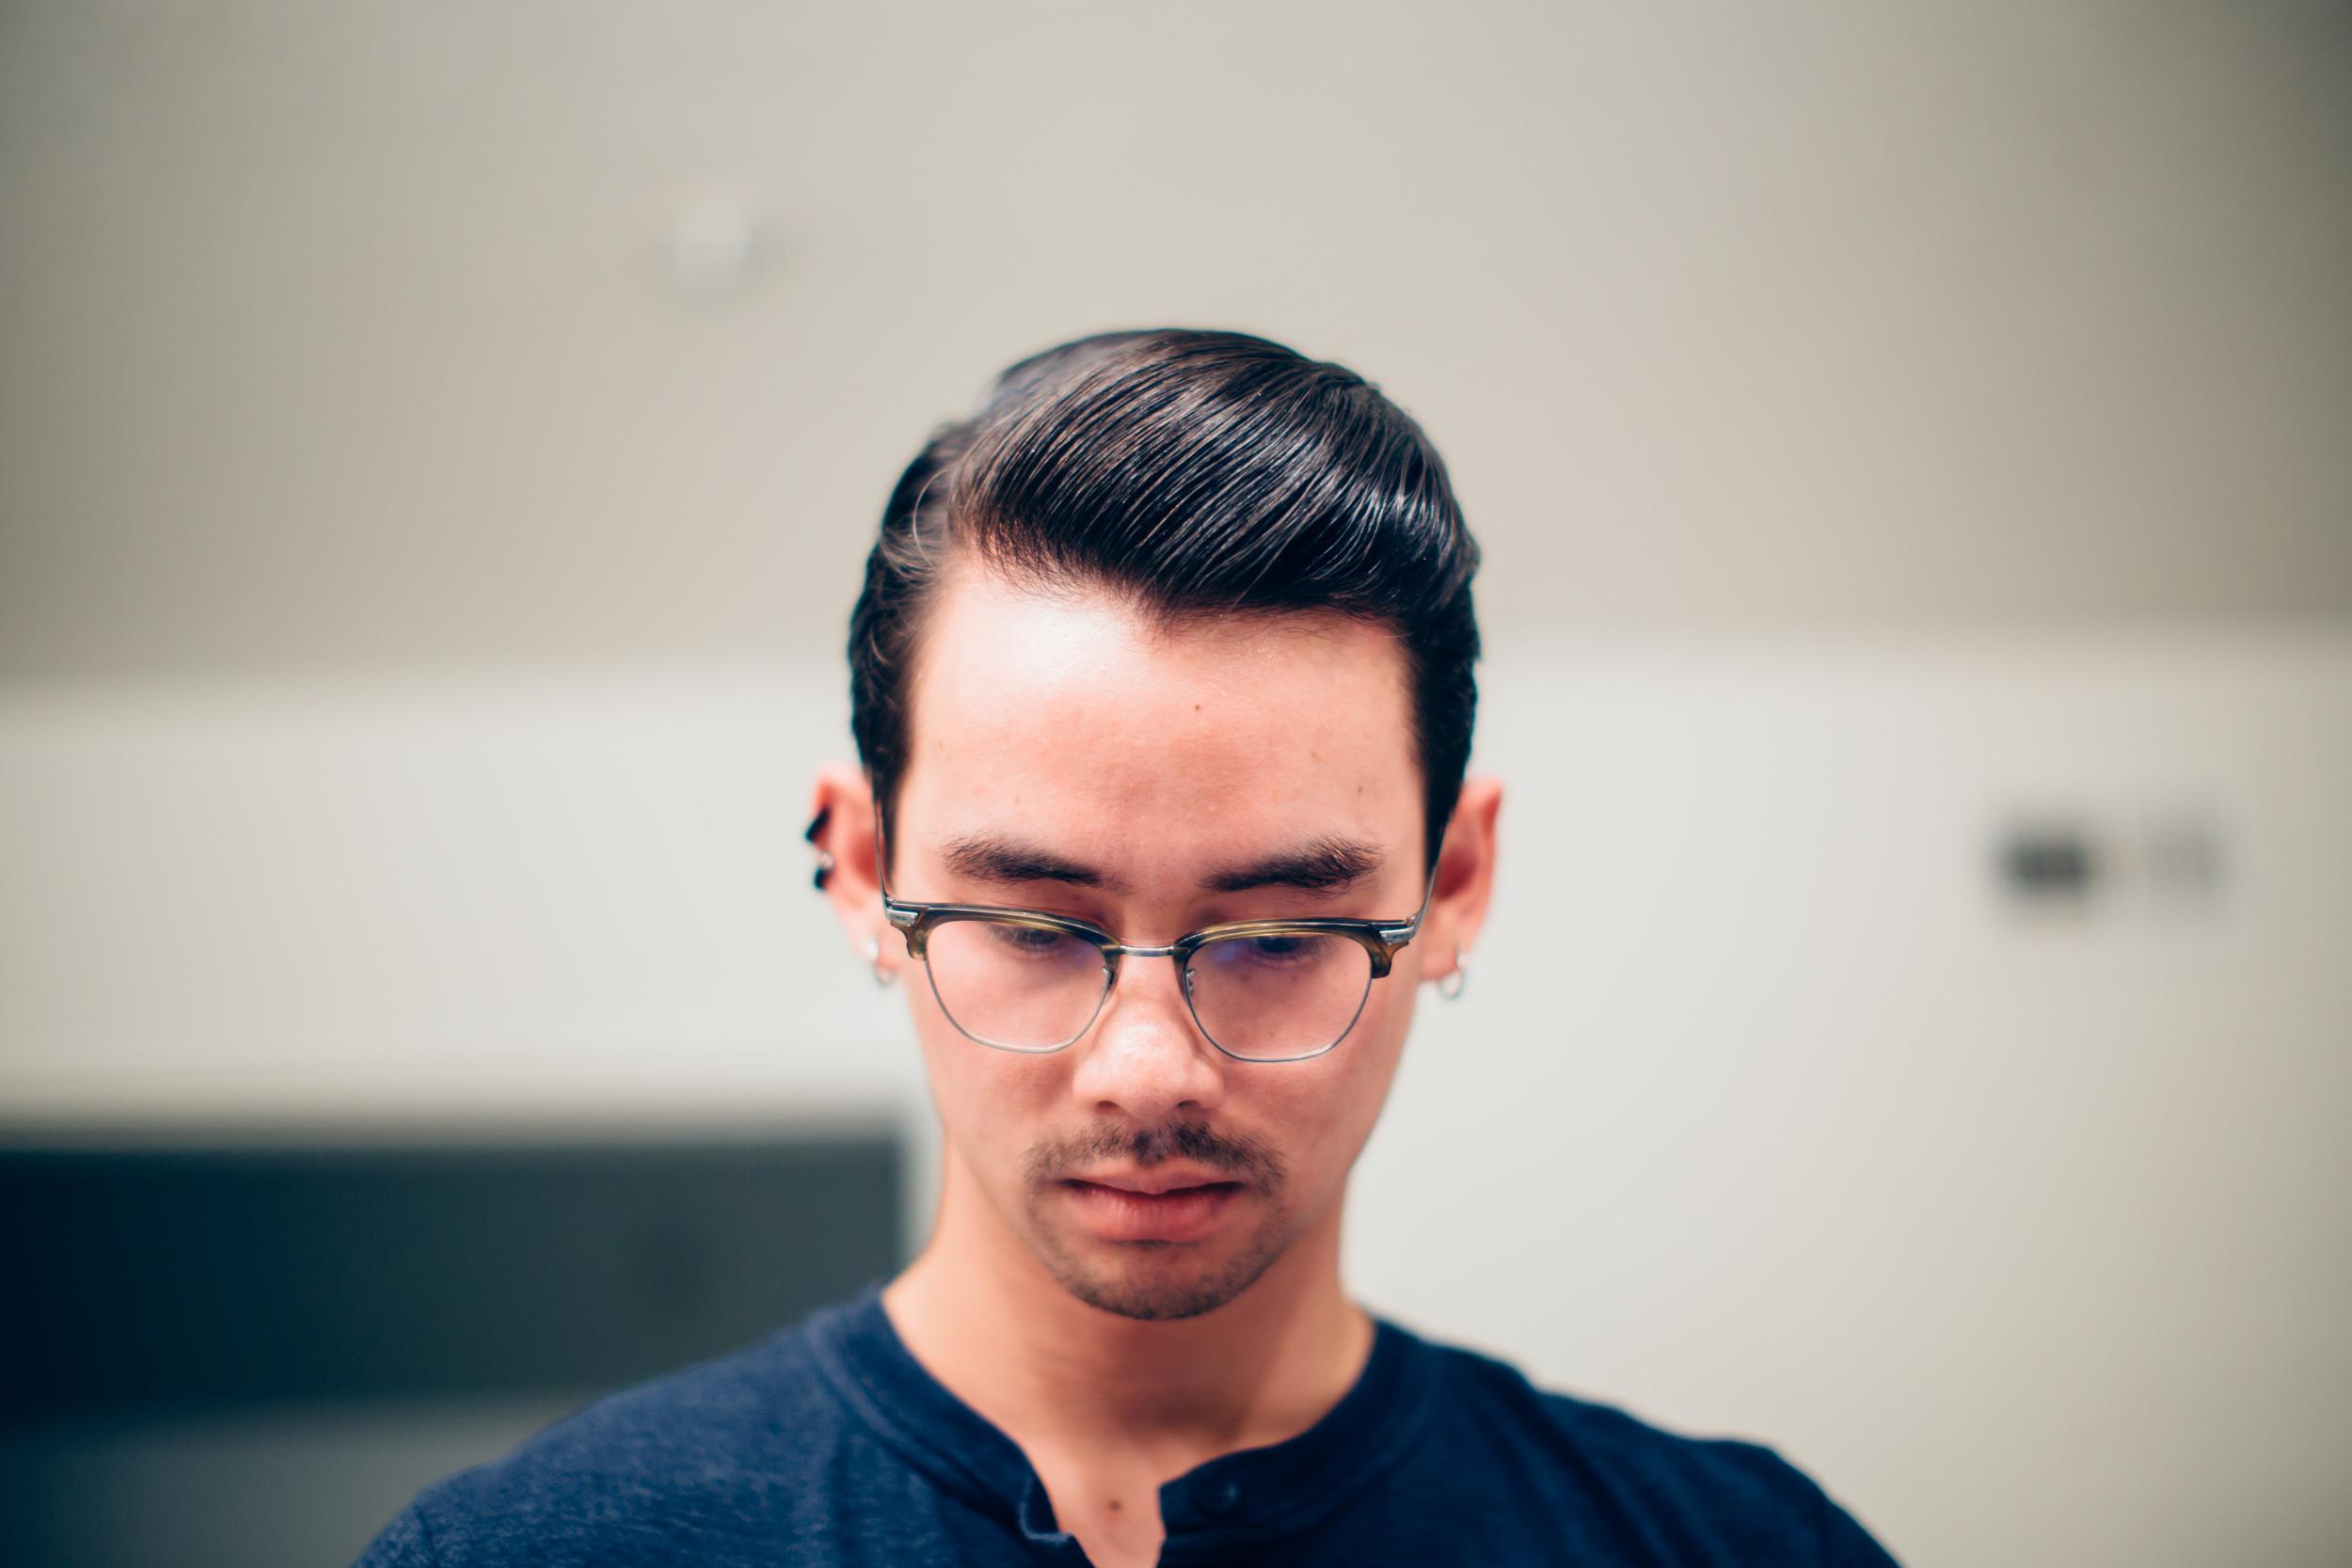 David Elliot Pomade - Hairstyle